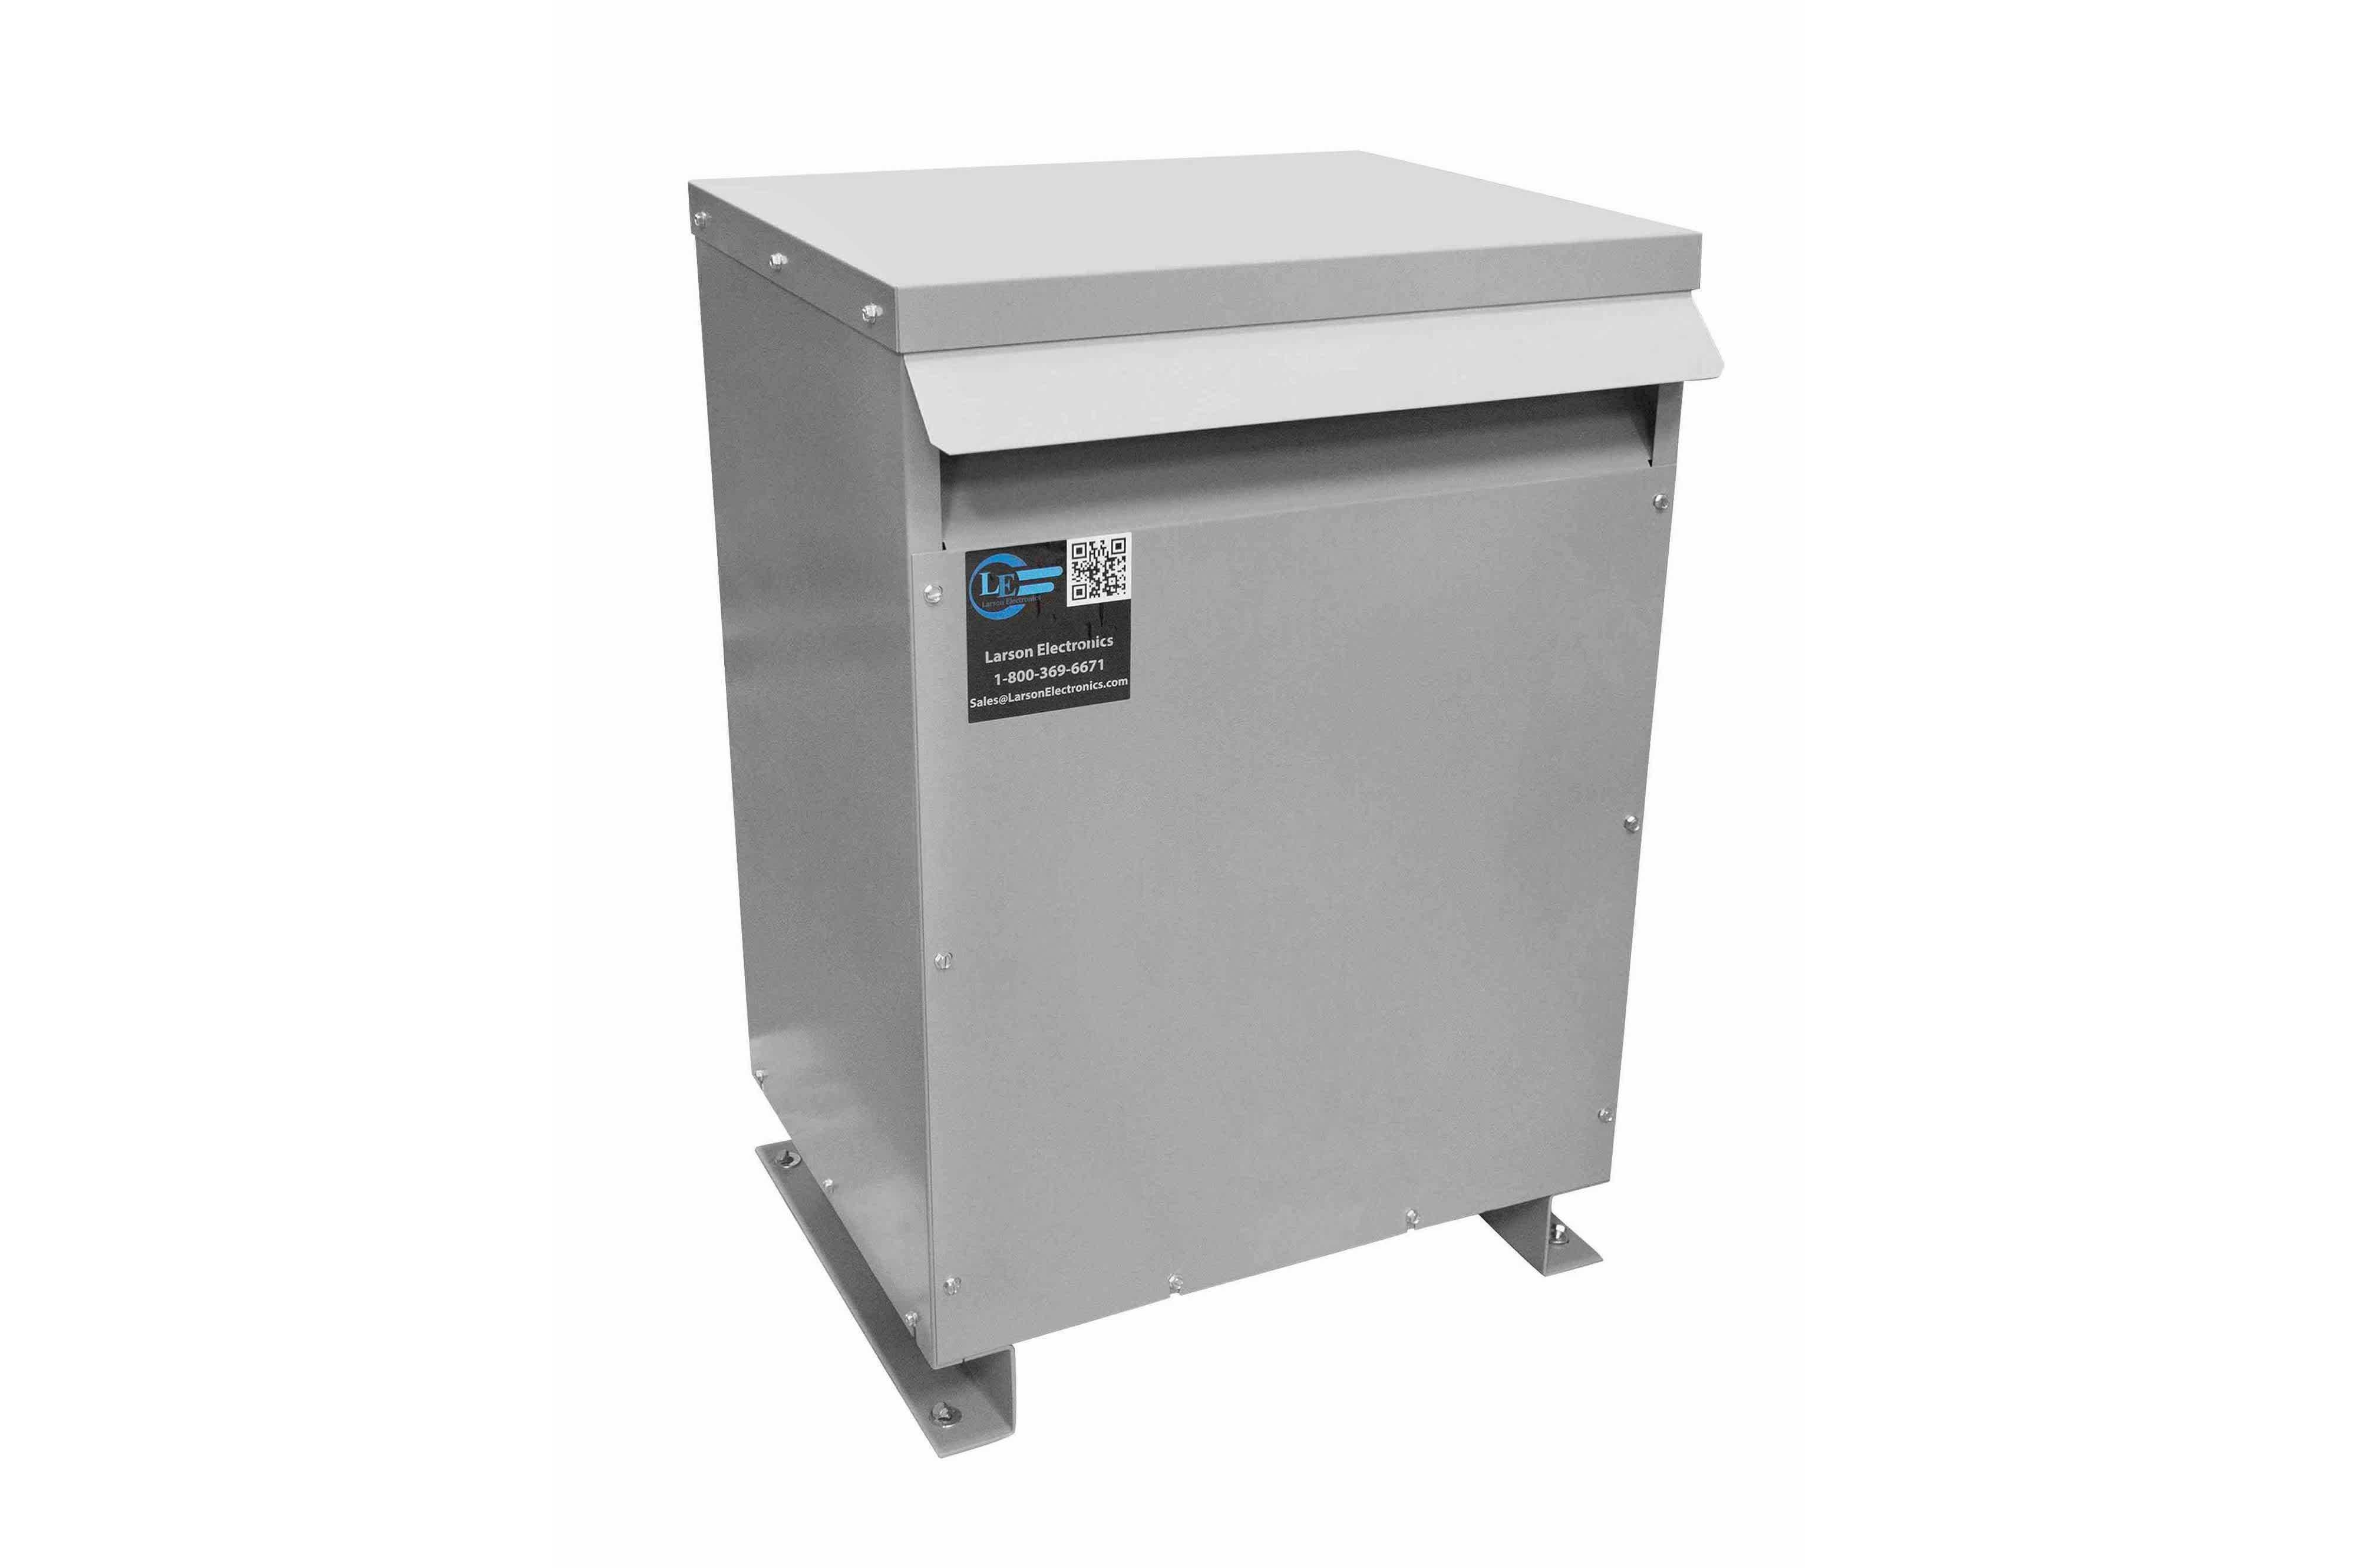 35 kVA 3PH Isolation Transformer, 480V Wye Primary, 208Y/120 Wye-N Secondary, N3R, Ventilated, 60 Hz